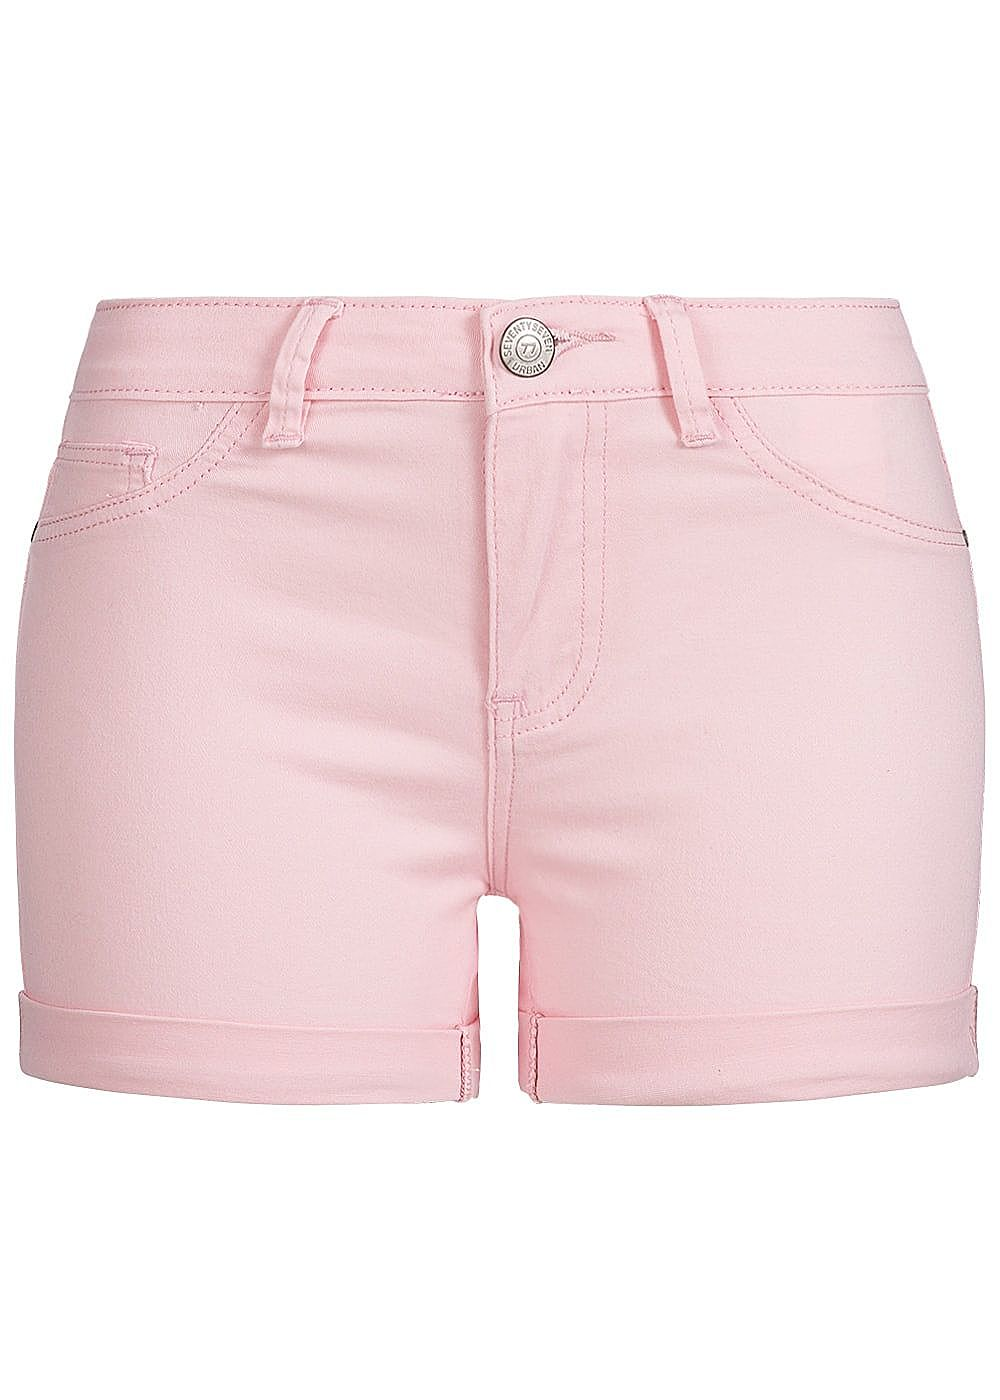 fc4ae40715e3d7 Seventyseven Lifestyle Damen Shorts 2-Pockets Beinumschlag 2 Deko ...